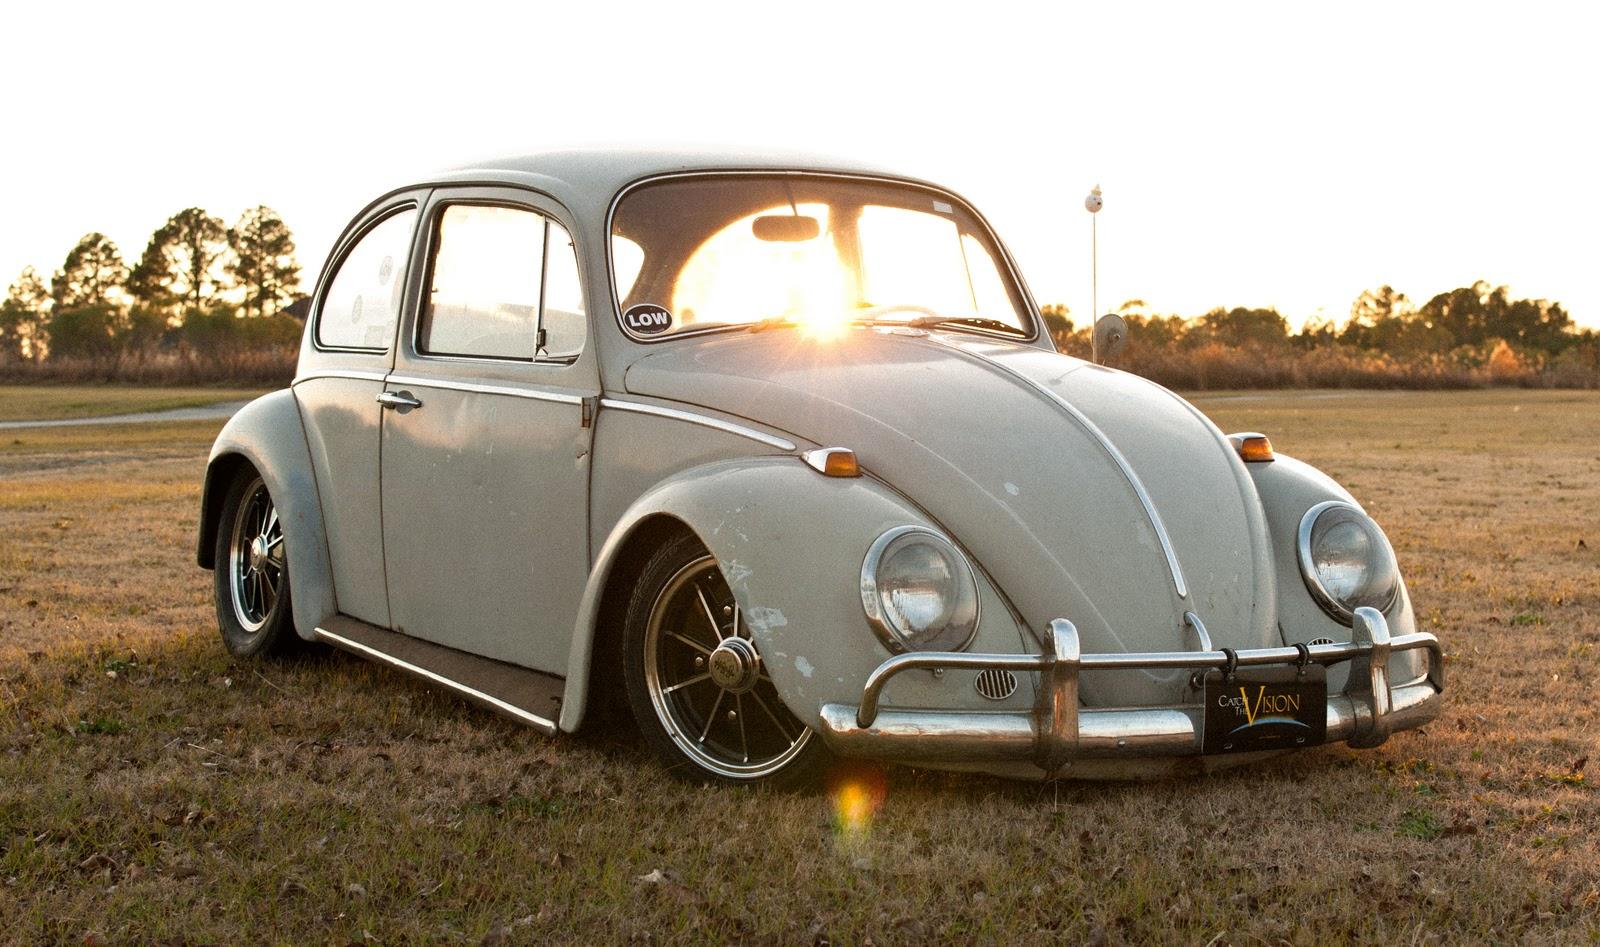 Otis - my '65 Beetle DSC_0005-2